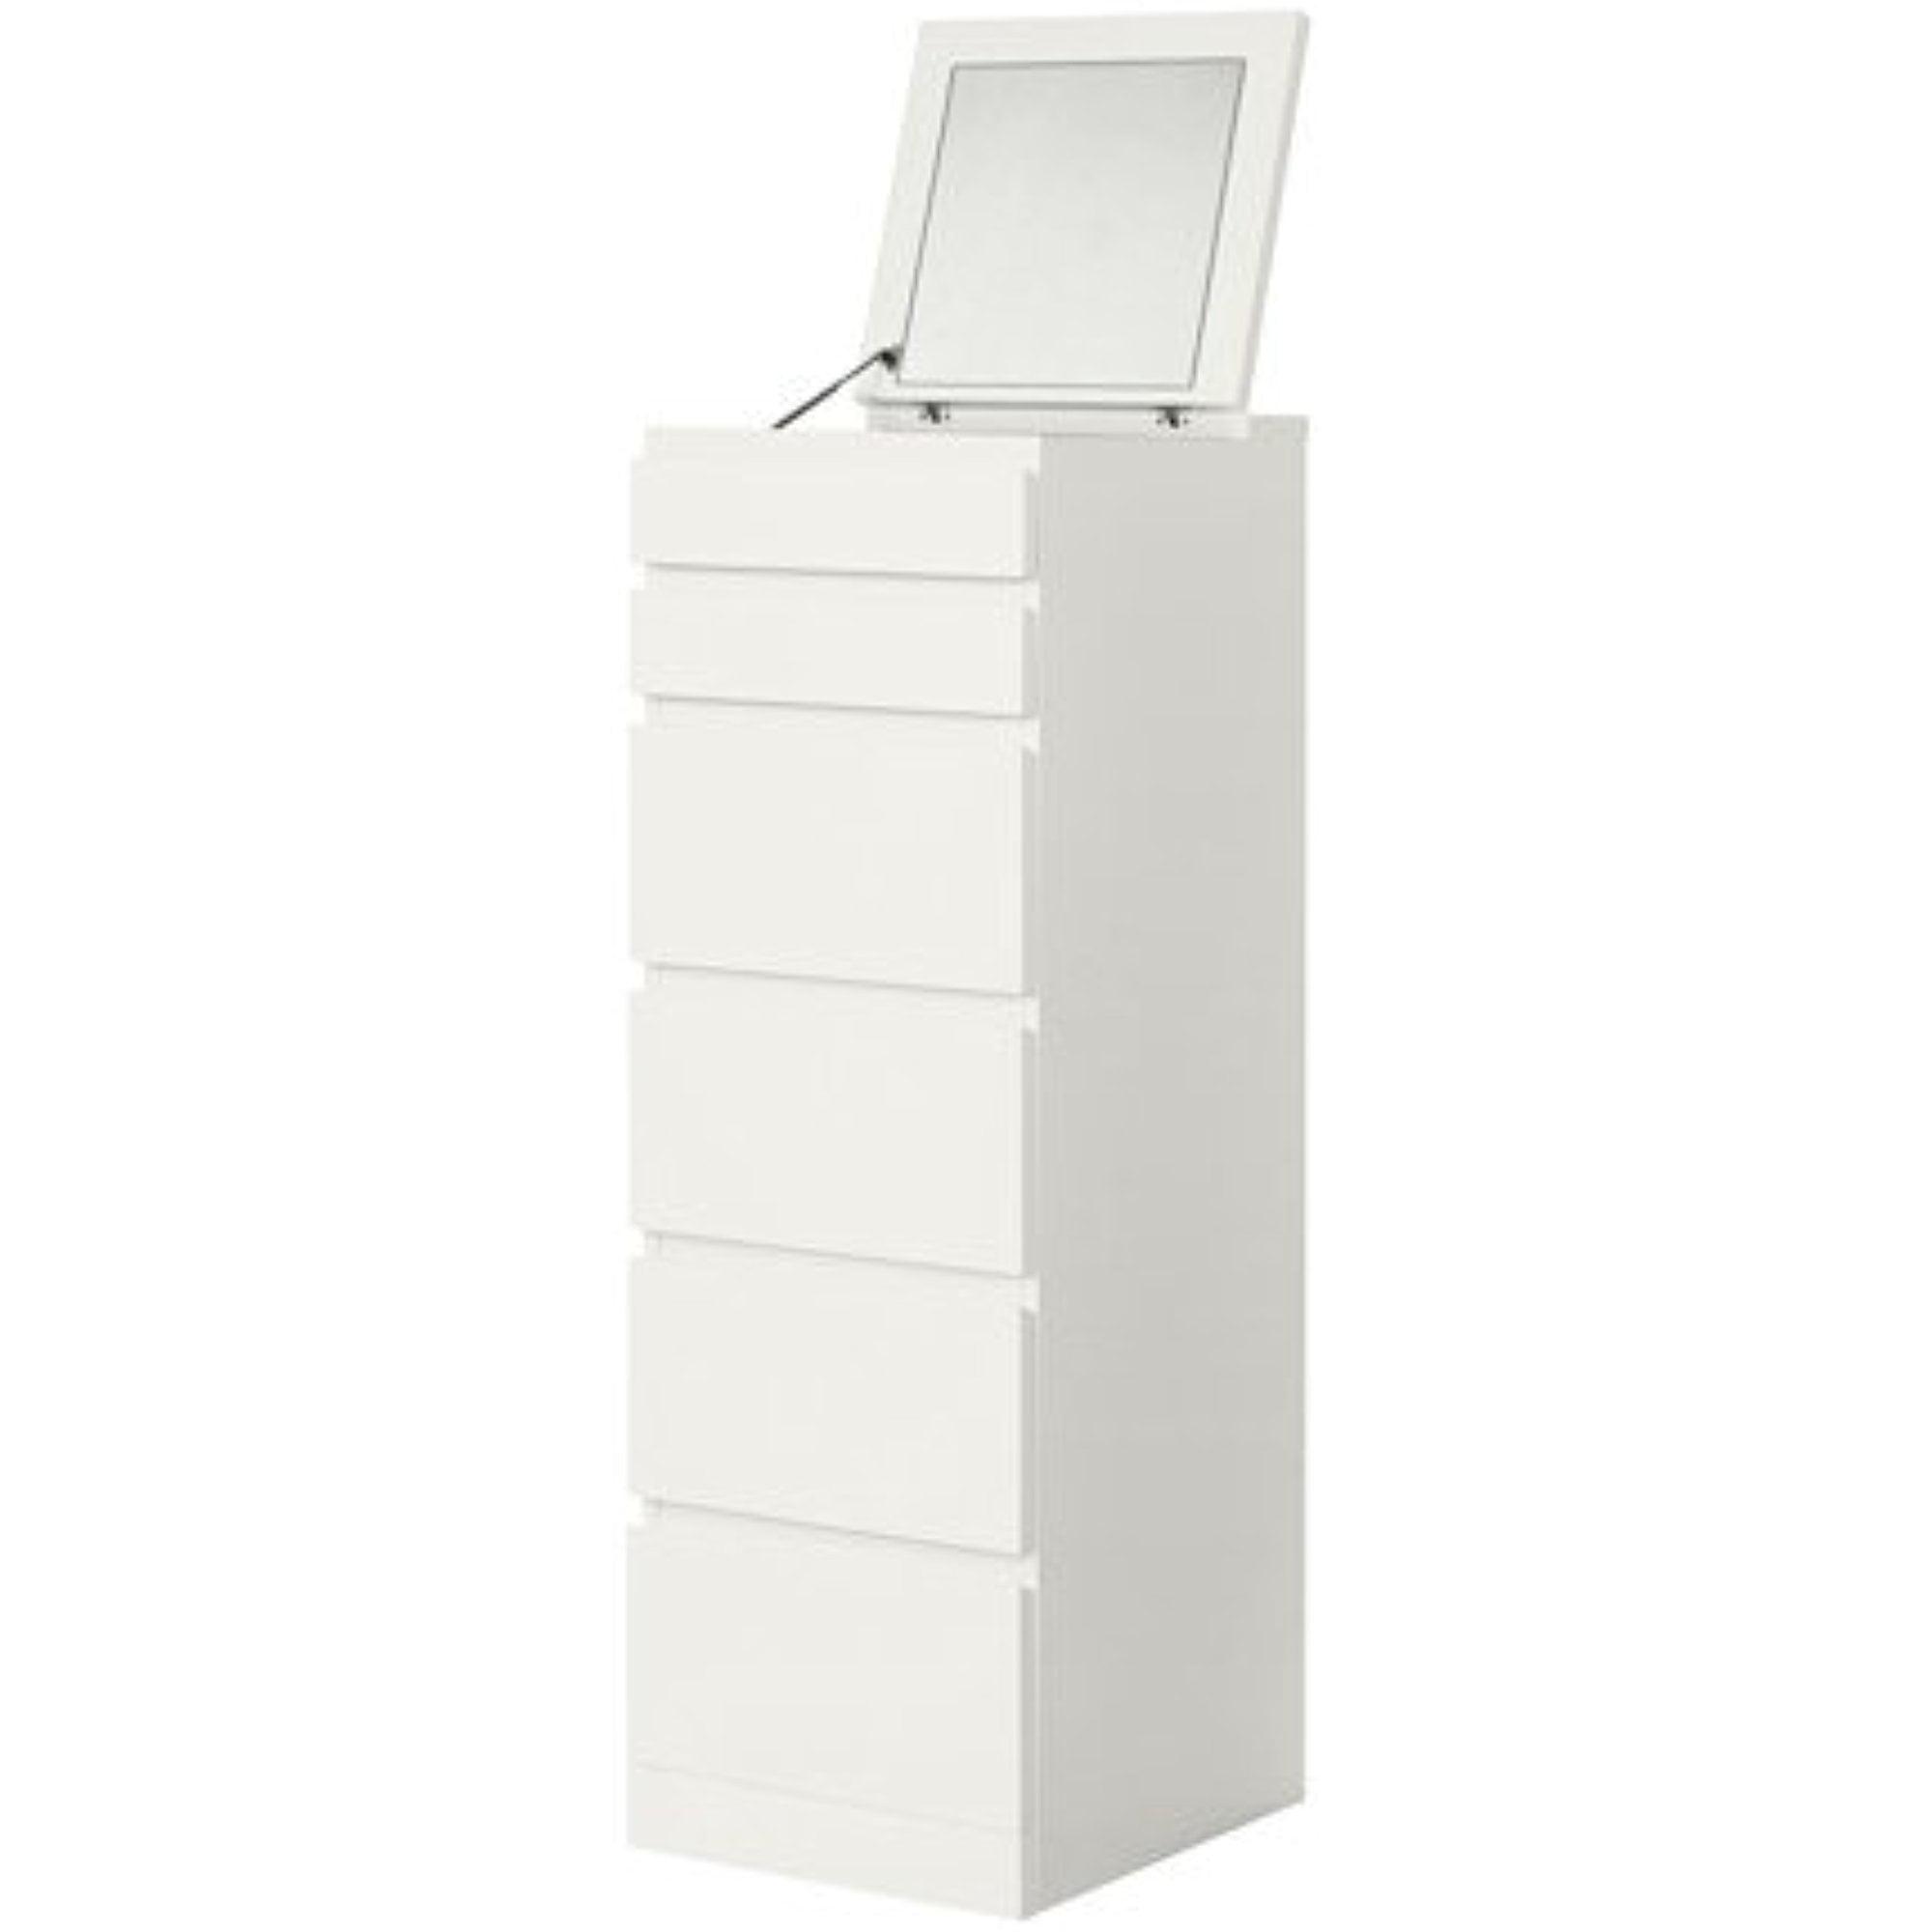 Ikea 6 Drawer Chest White Mirror Glass 15 3 4x48 3 8 22214 20214 166 Walmart Com Walmart Com